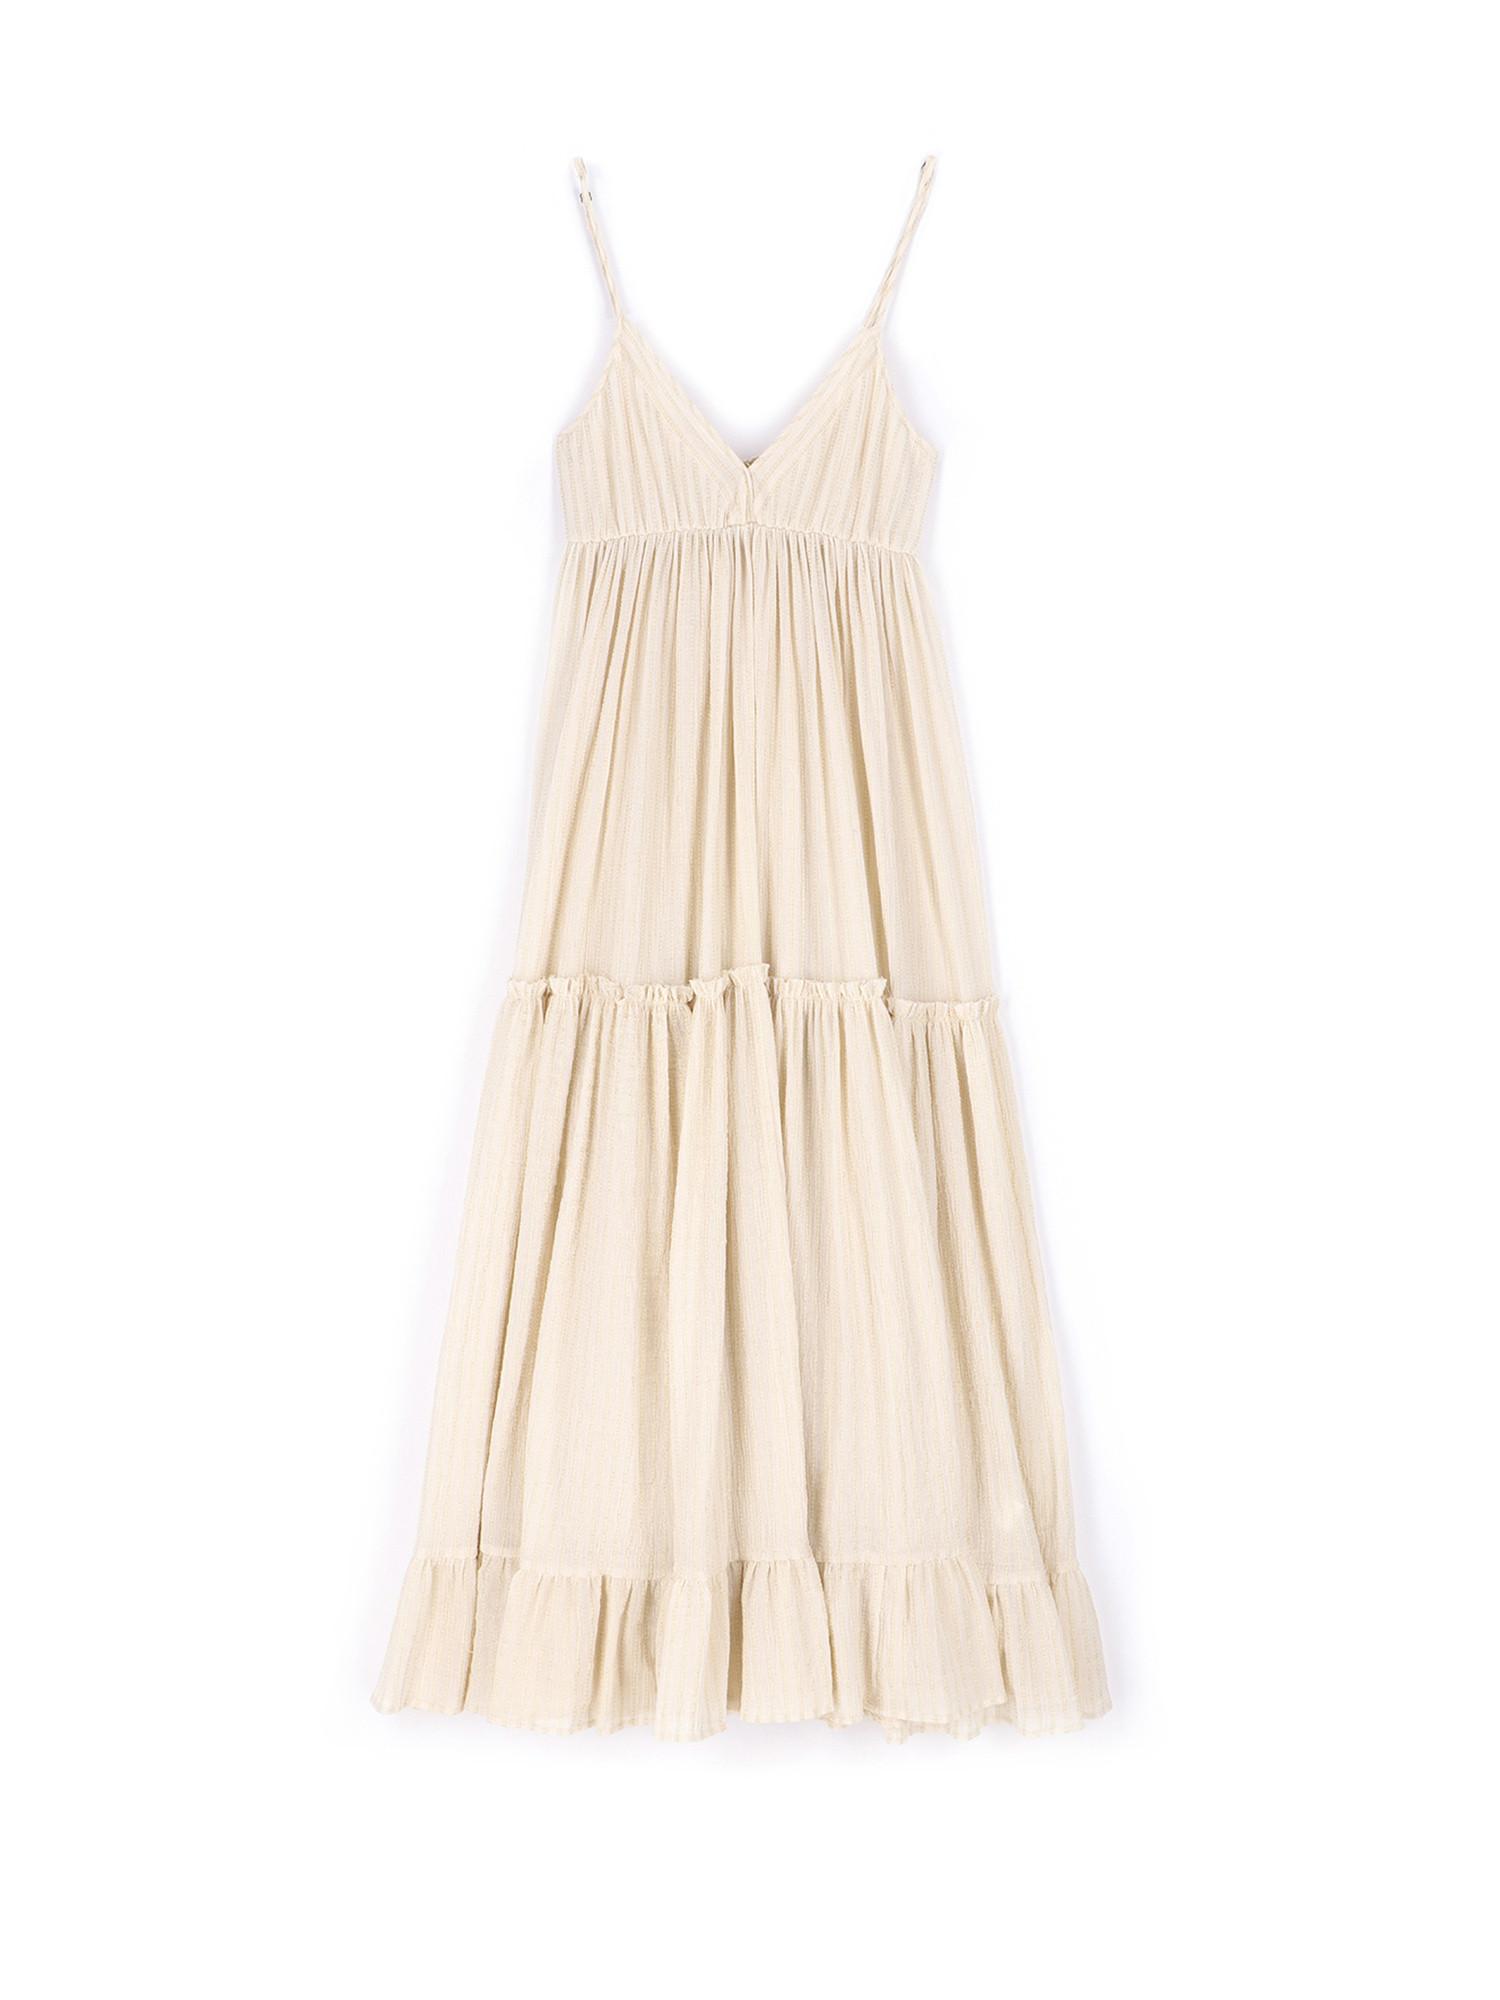 Vestito Carrara in garza leggera a righe, Bianco panna, large image number 0